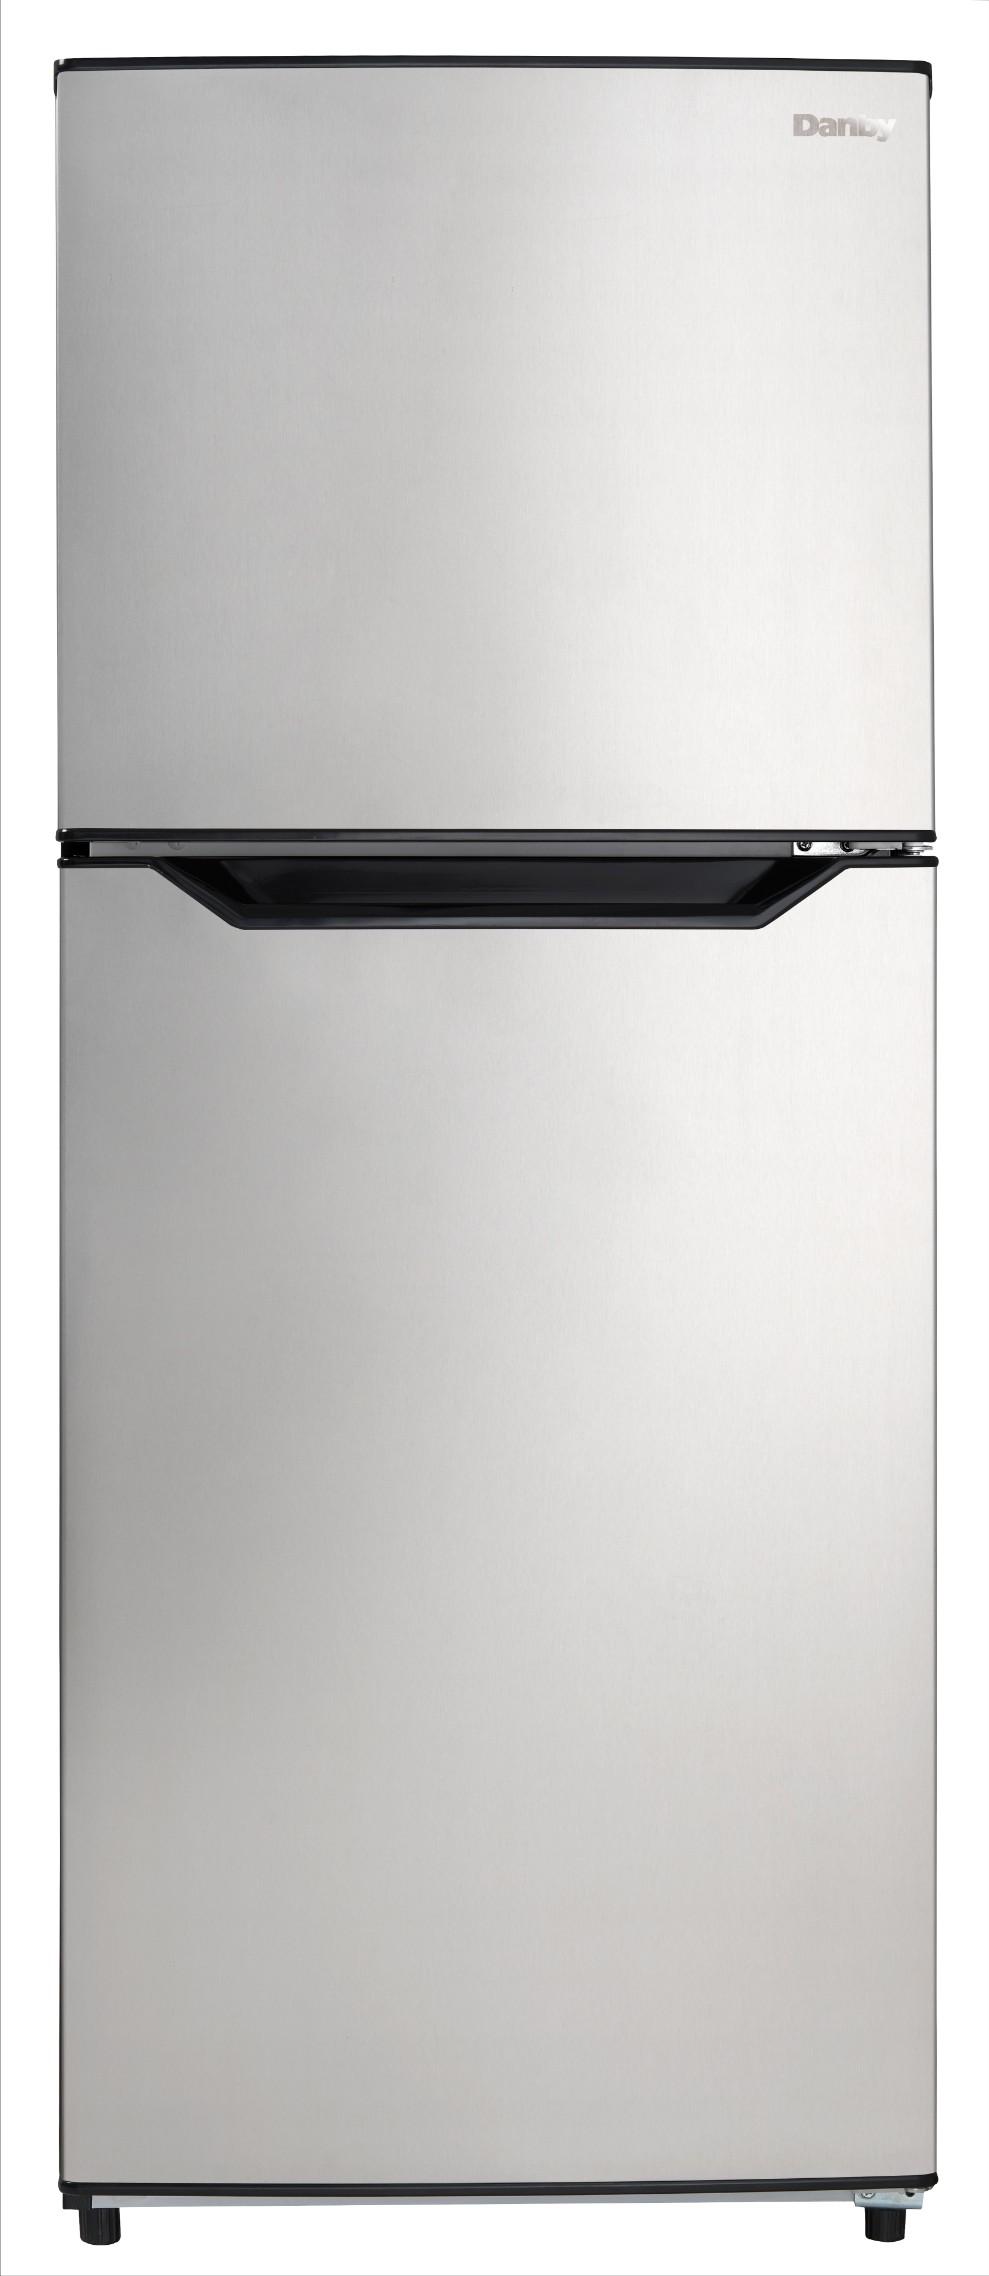 Danby 10.1 cu. ft. Apartment Size Refrigerator